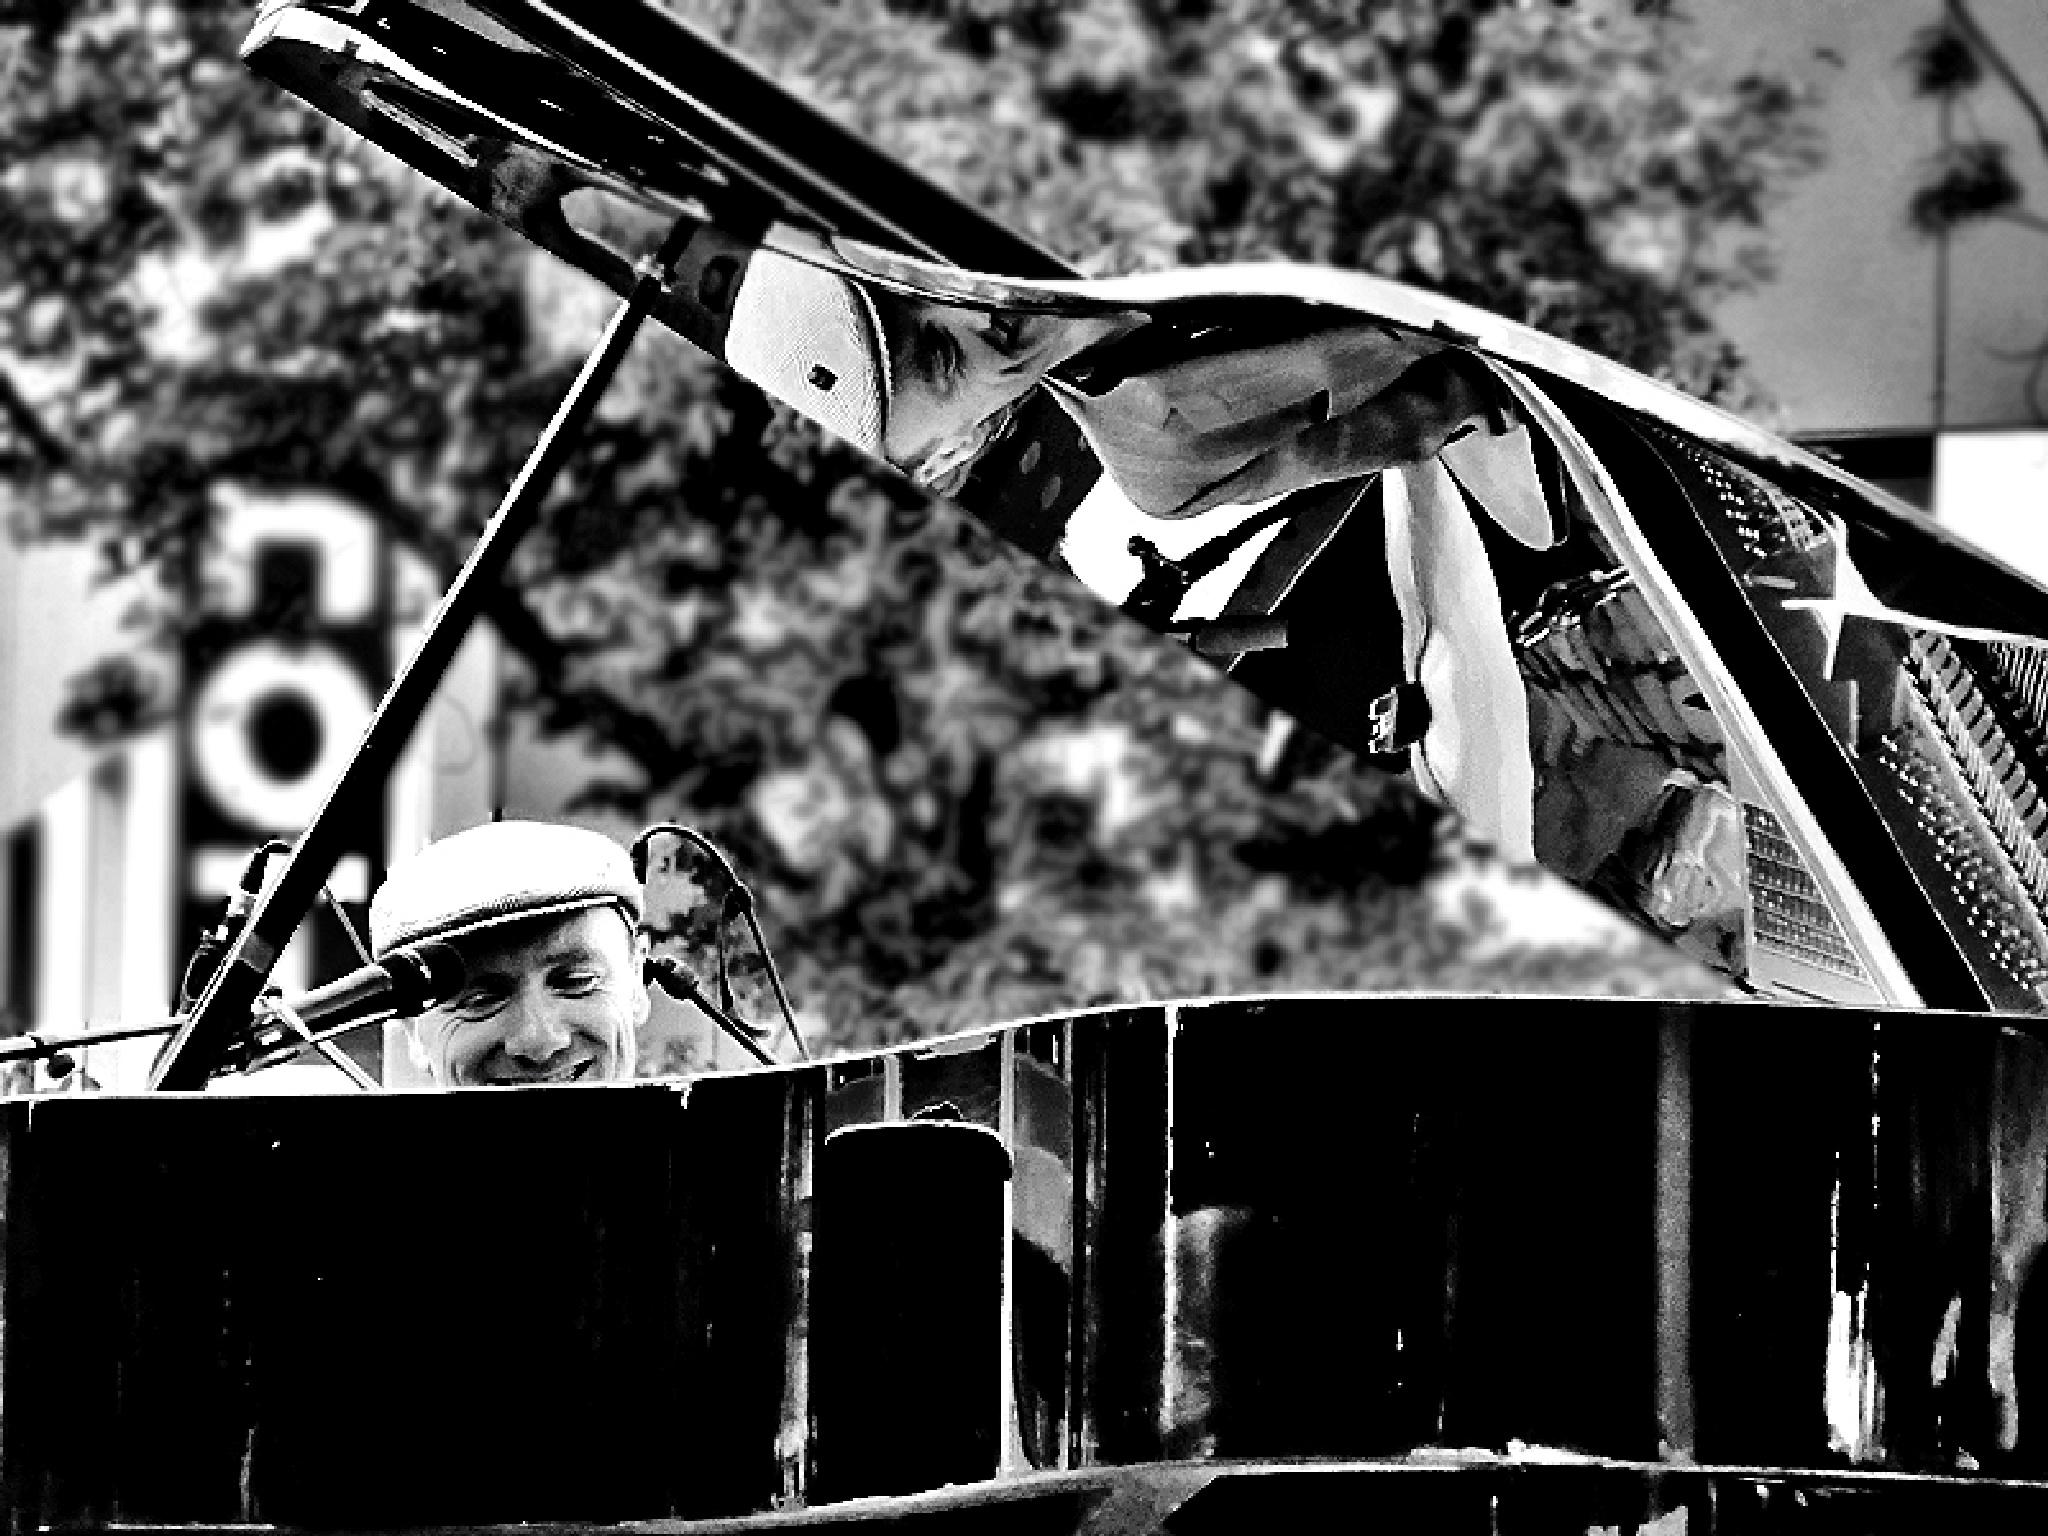 Piano player by Gernot Schwarz